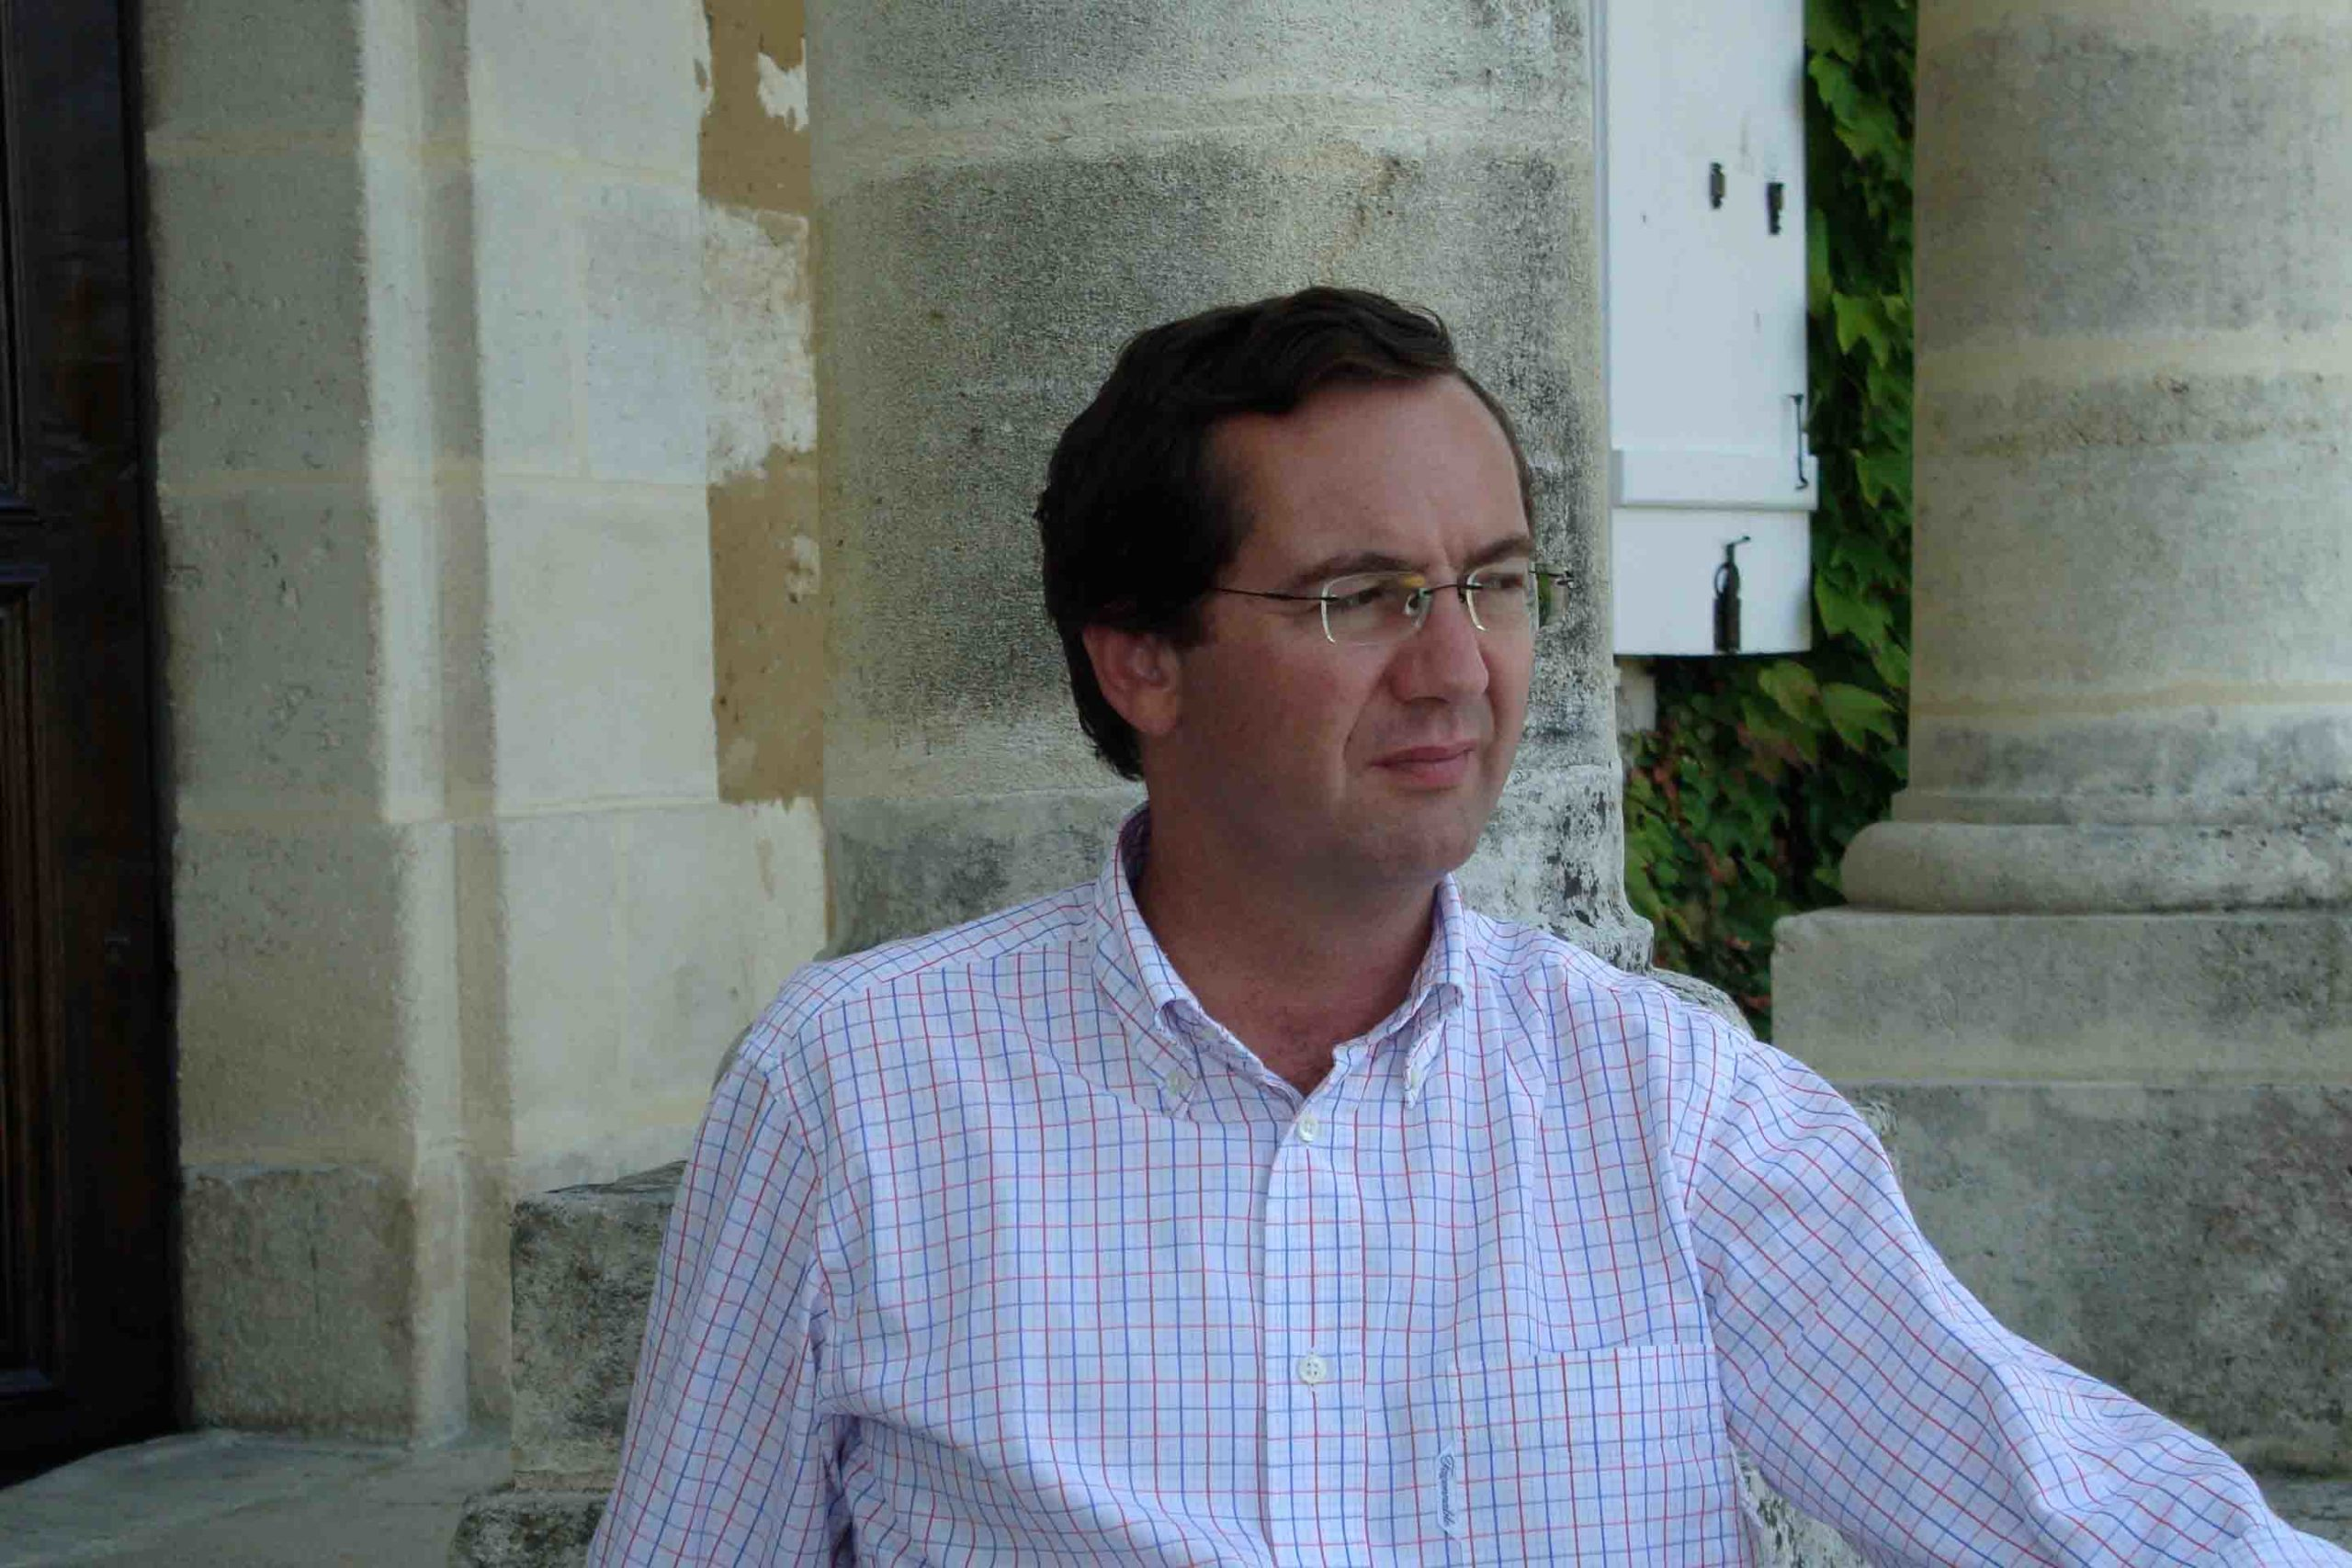 Philibert Perrin